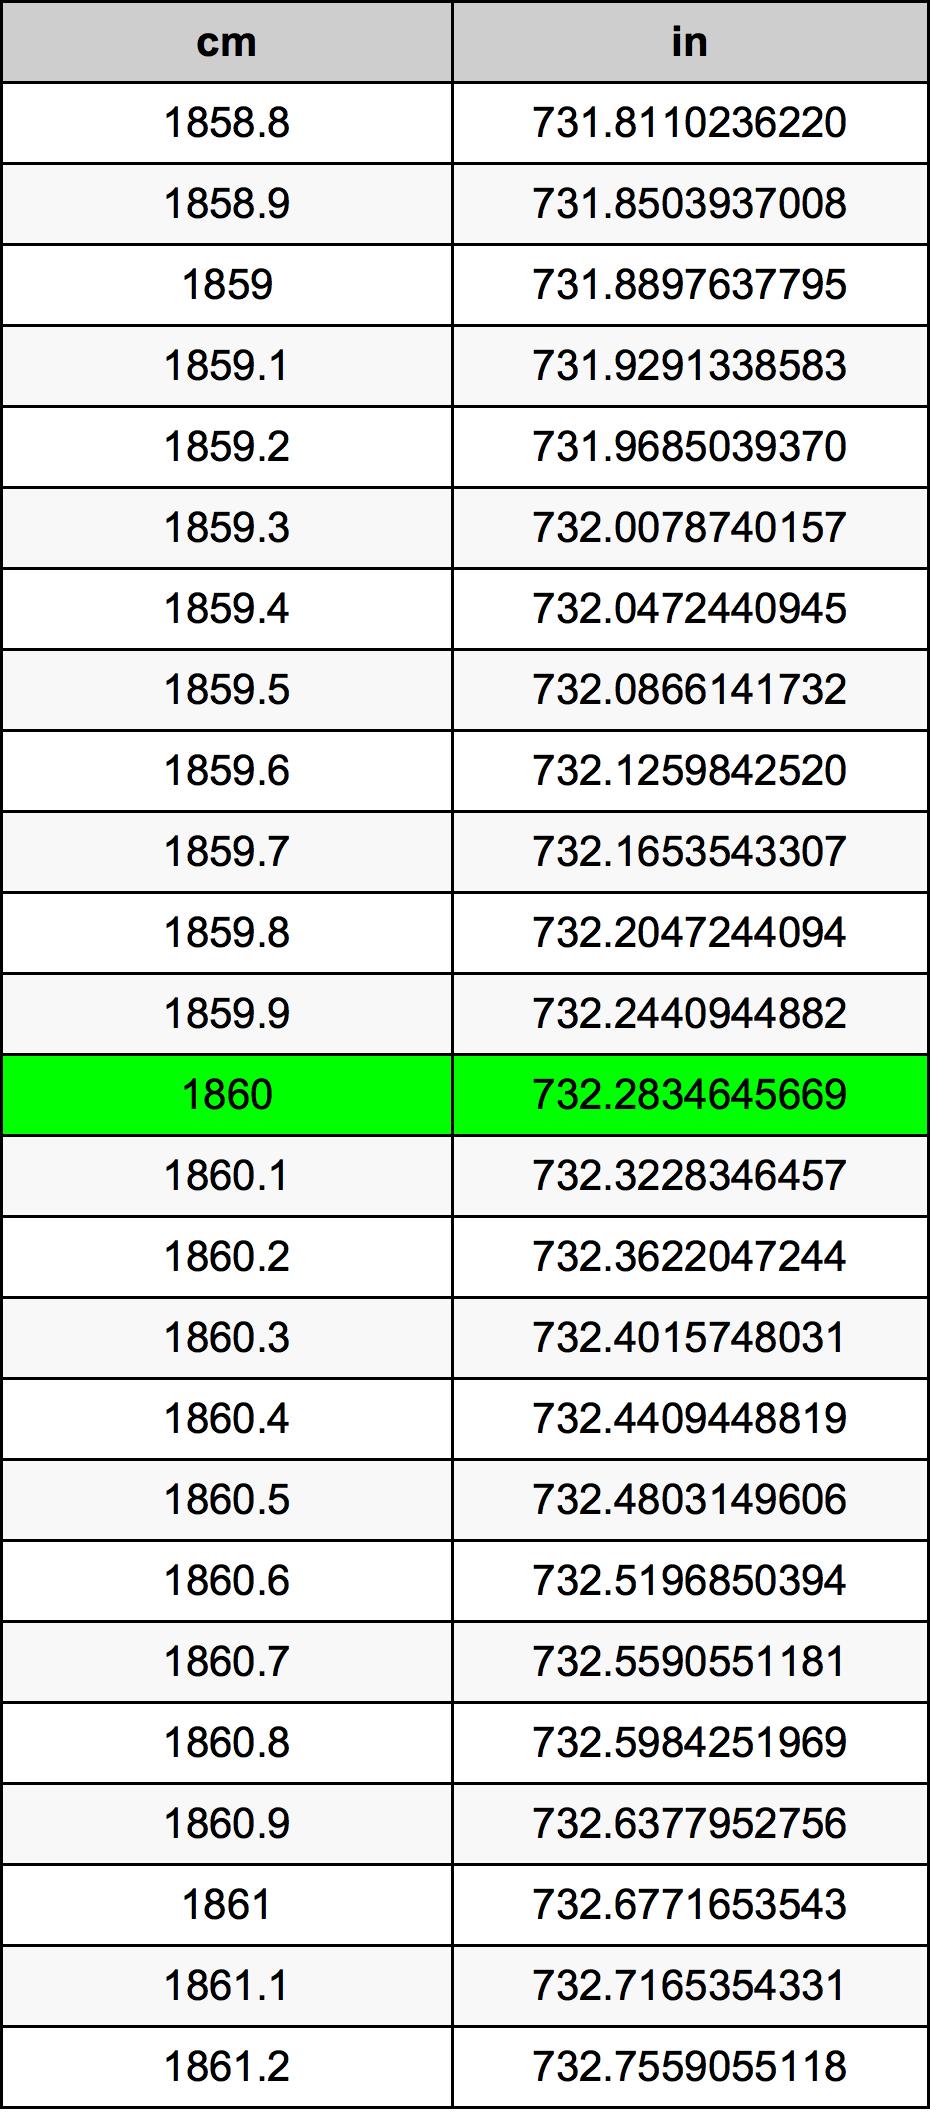 1860 Centimeter pretvorbena tabela